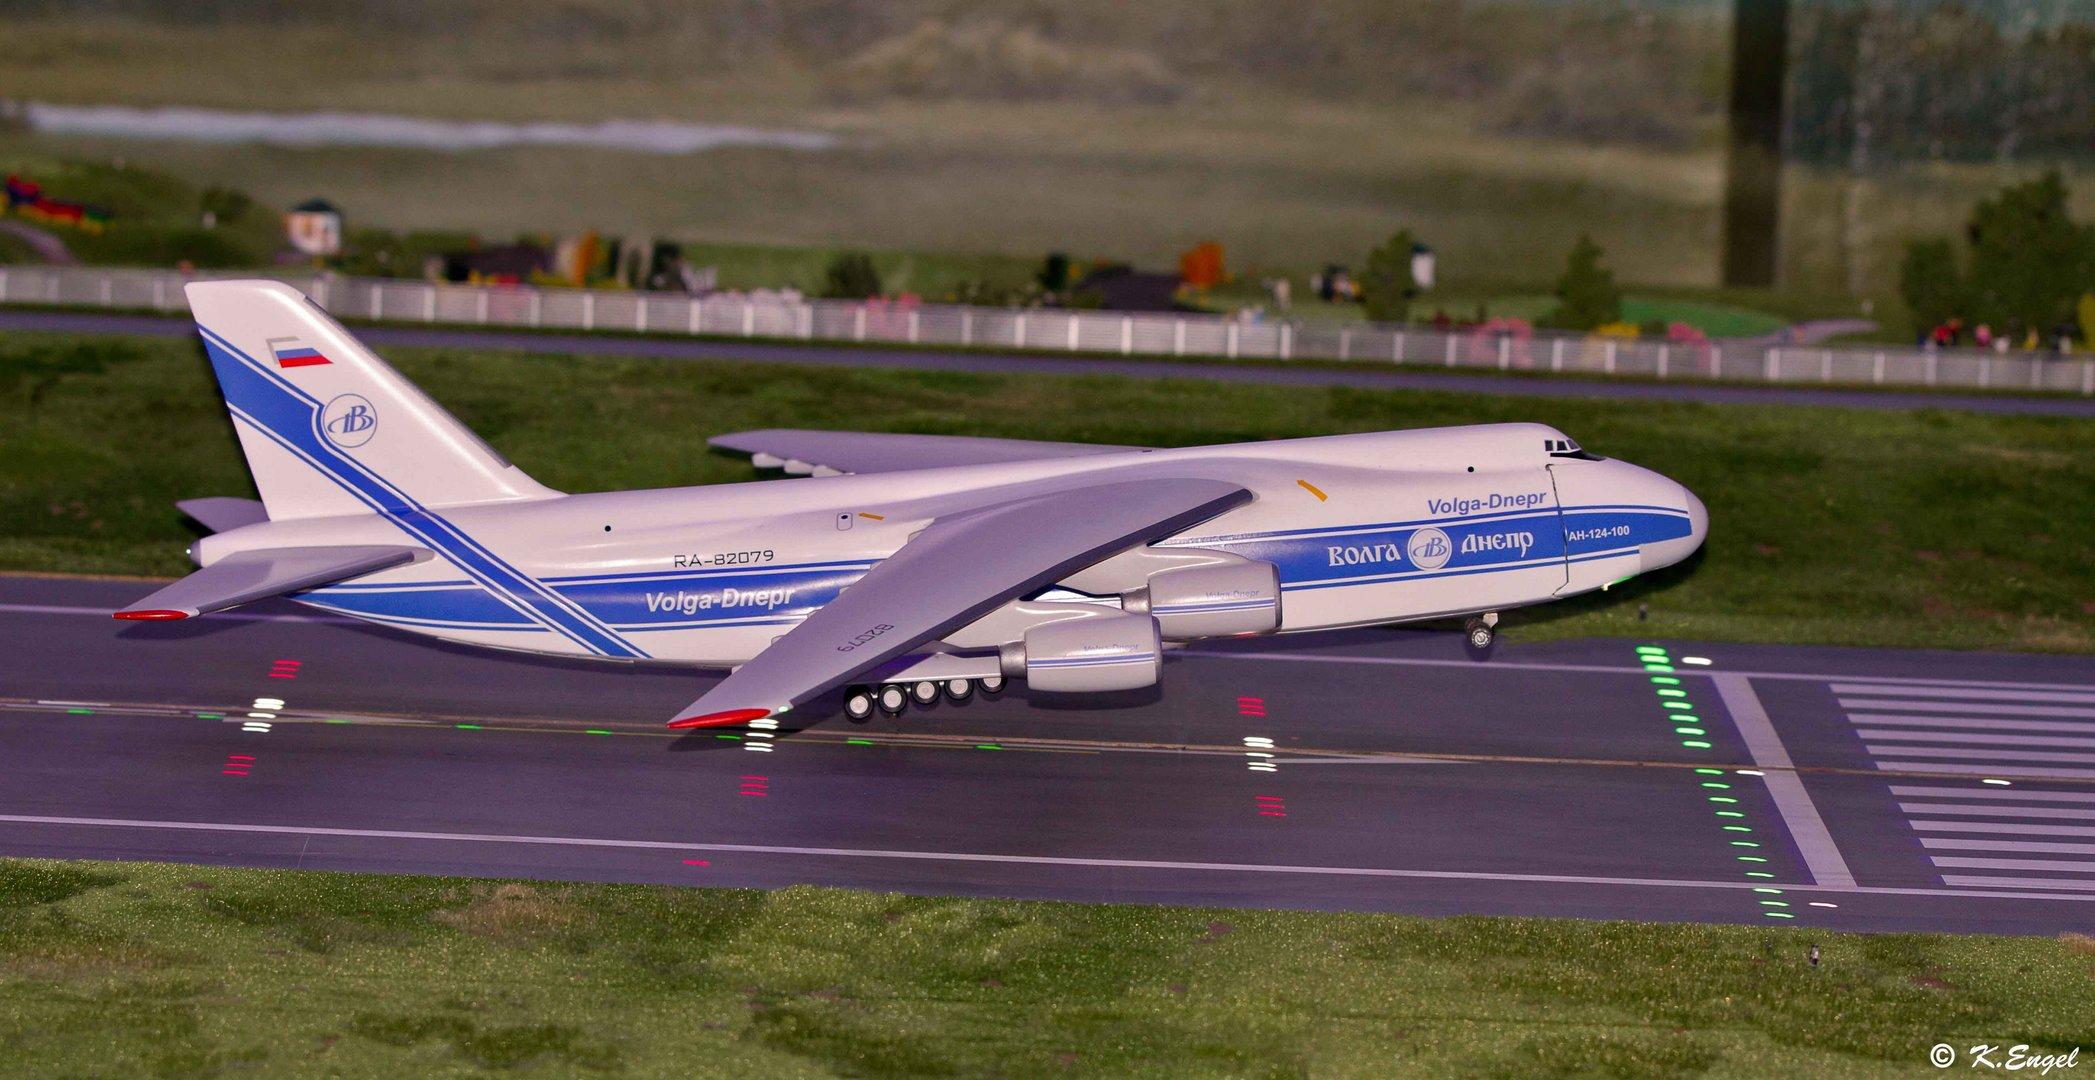 Landung in Knuffingen Airport